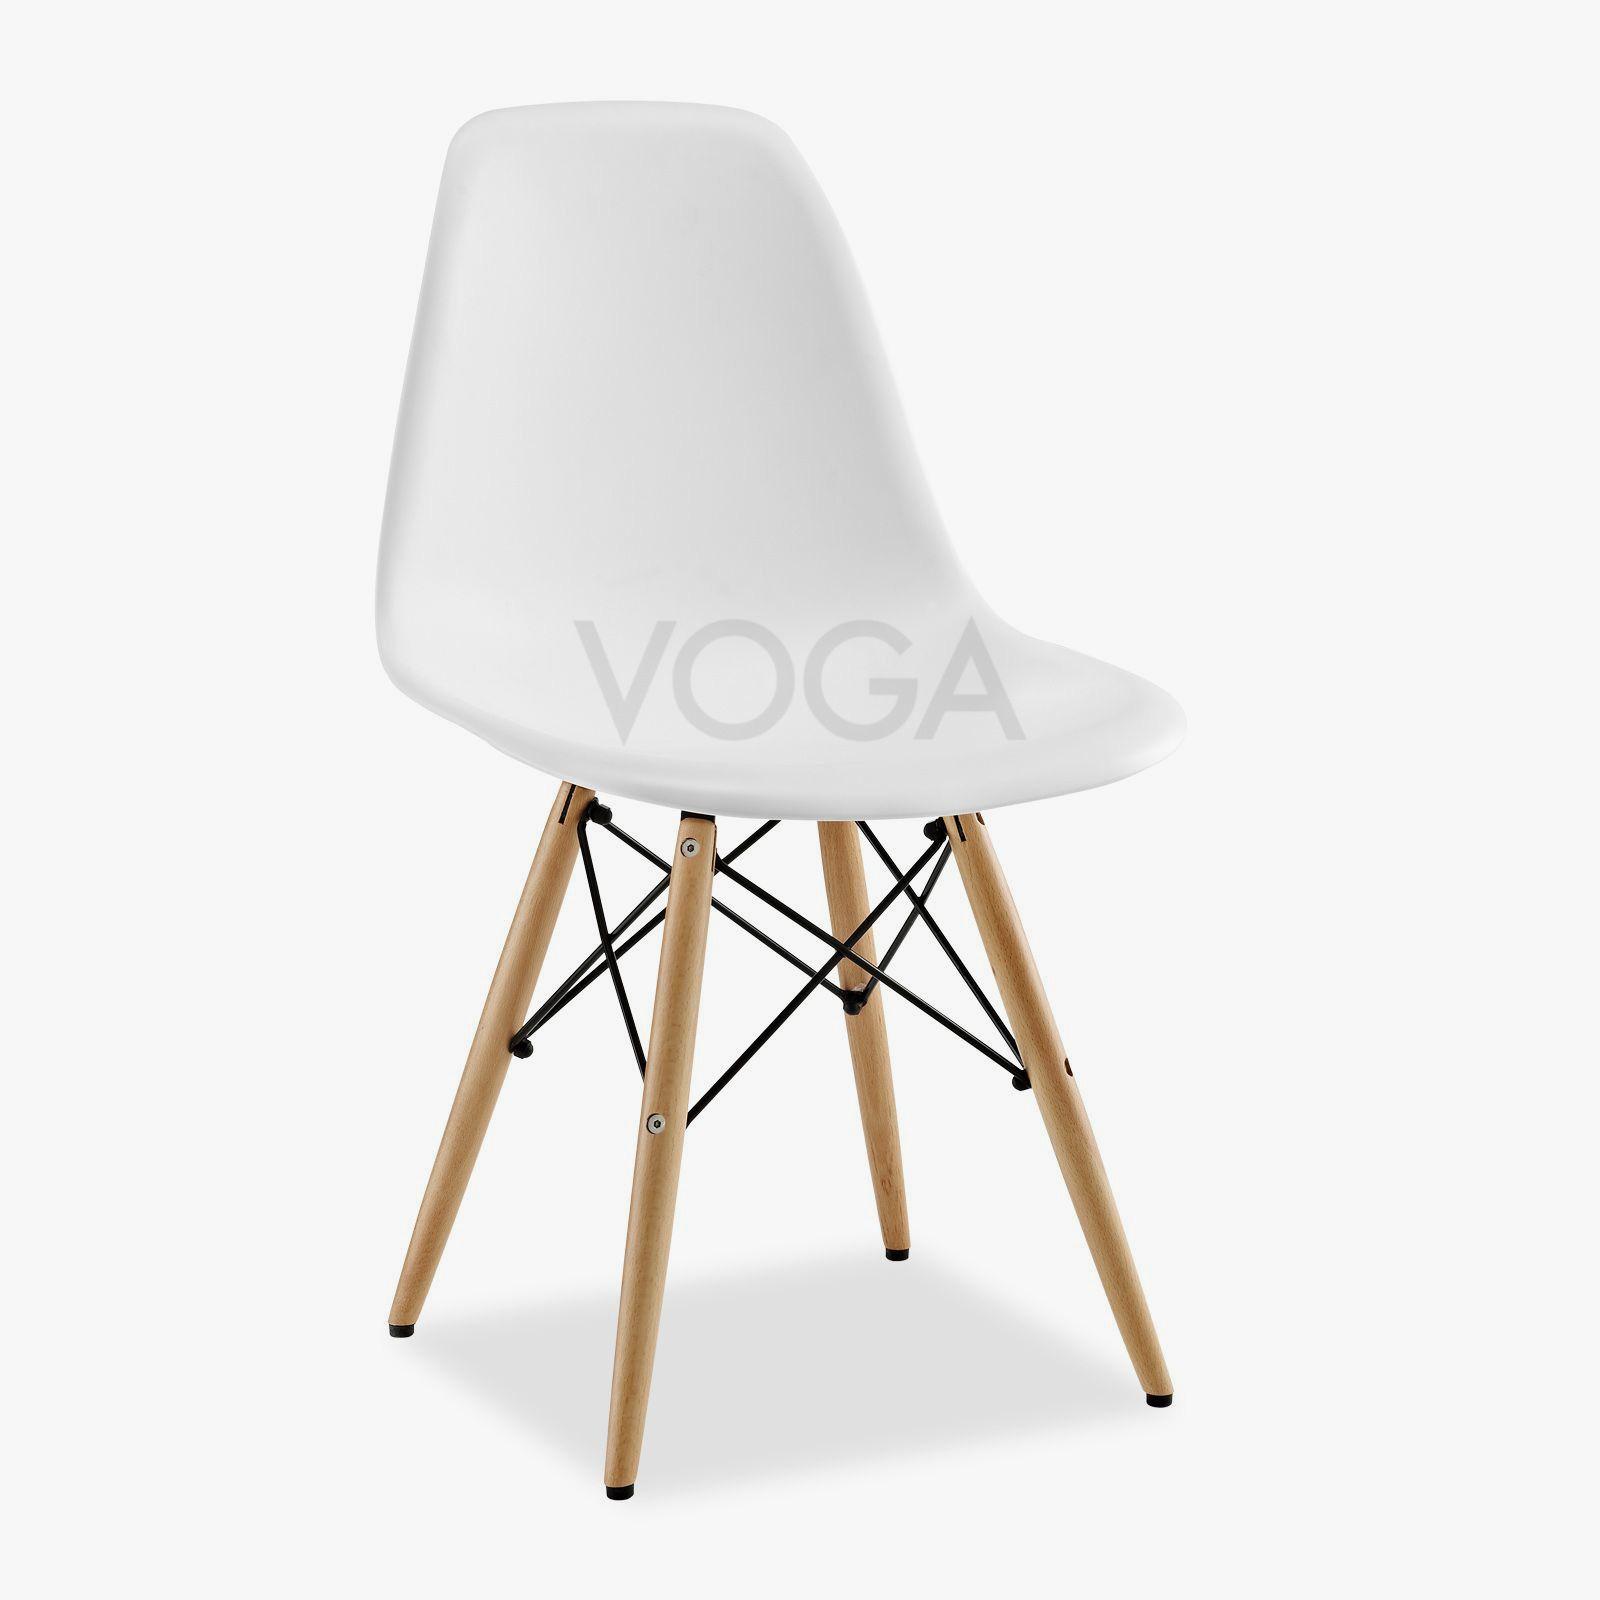 Dsw Stuhl Eiffel Chair Eames Designerstuhle Voga Sedie